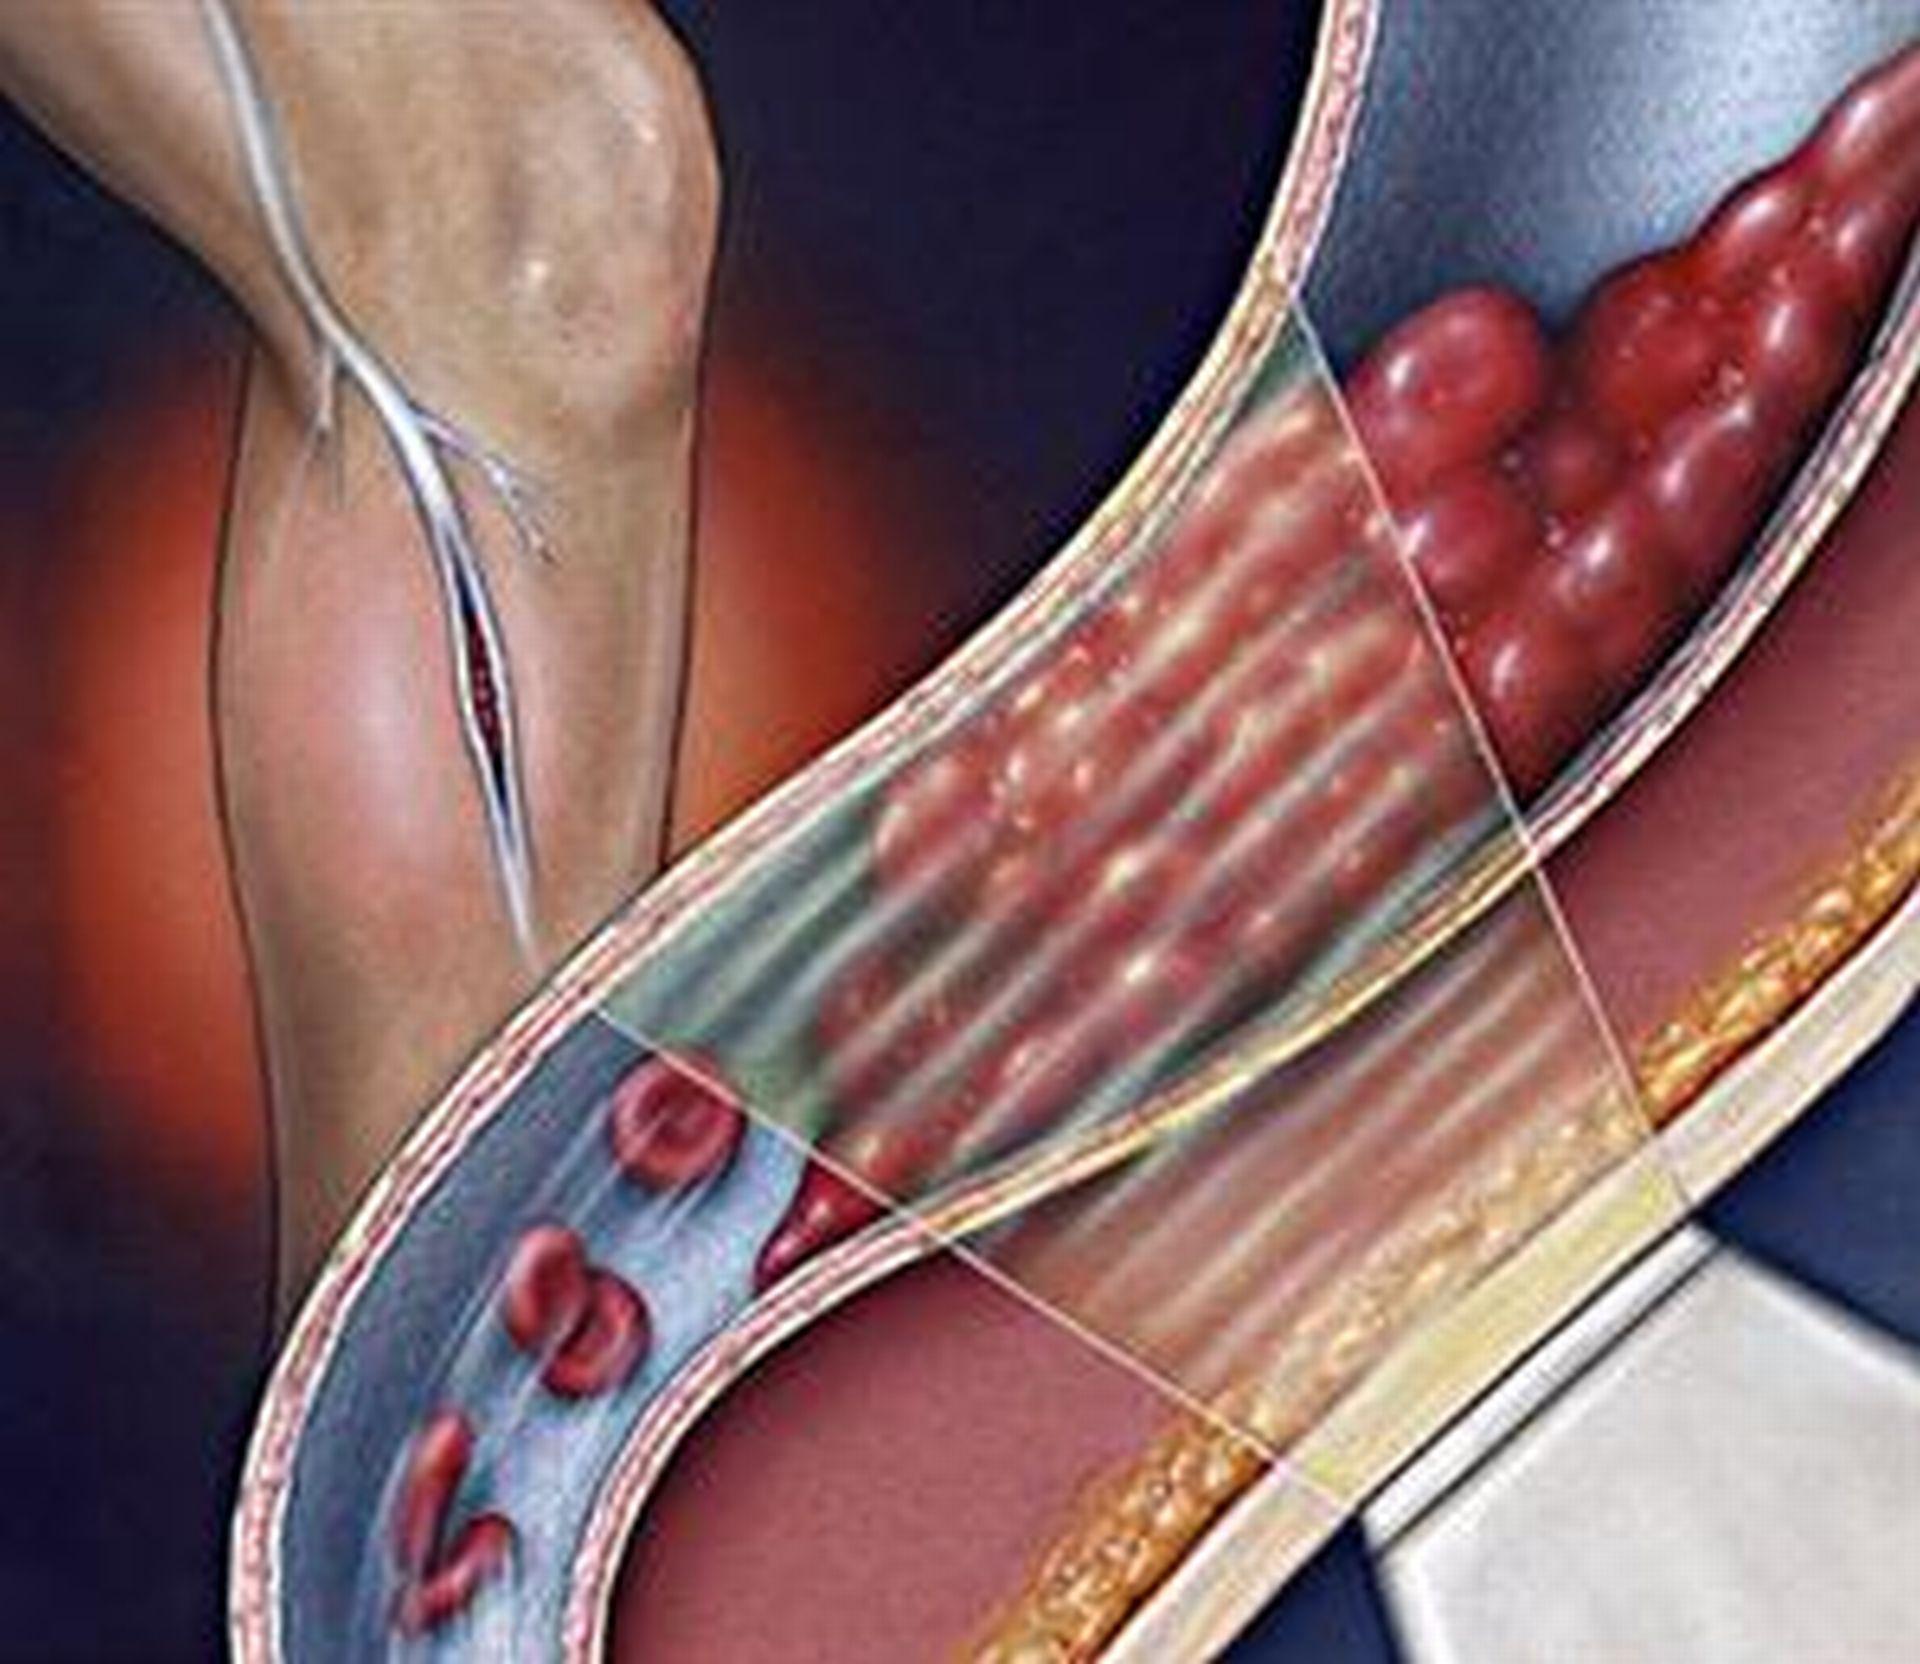 hipertenzijos slėgis nuo 160 iki 100